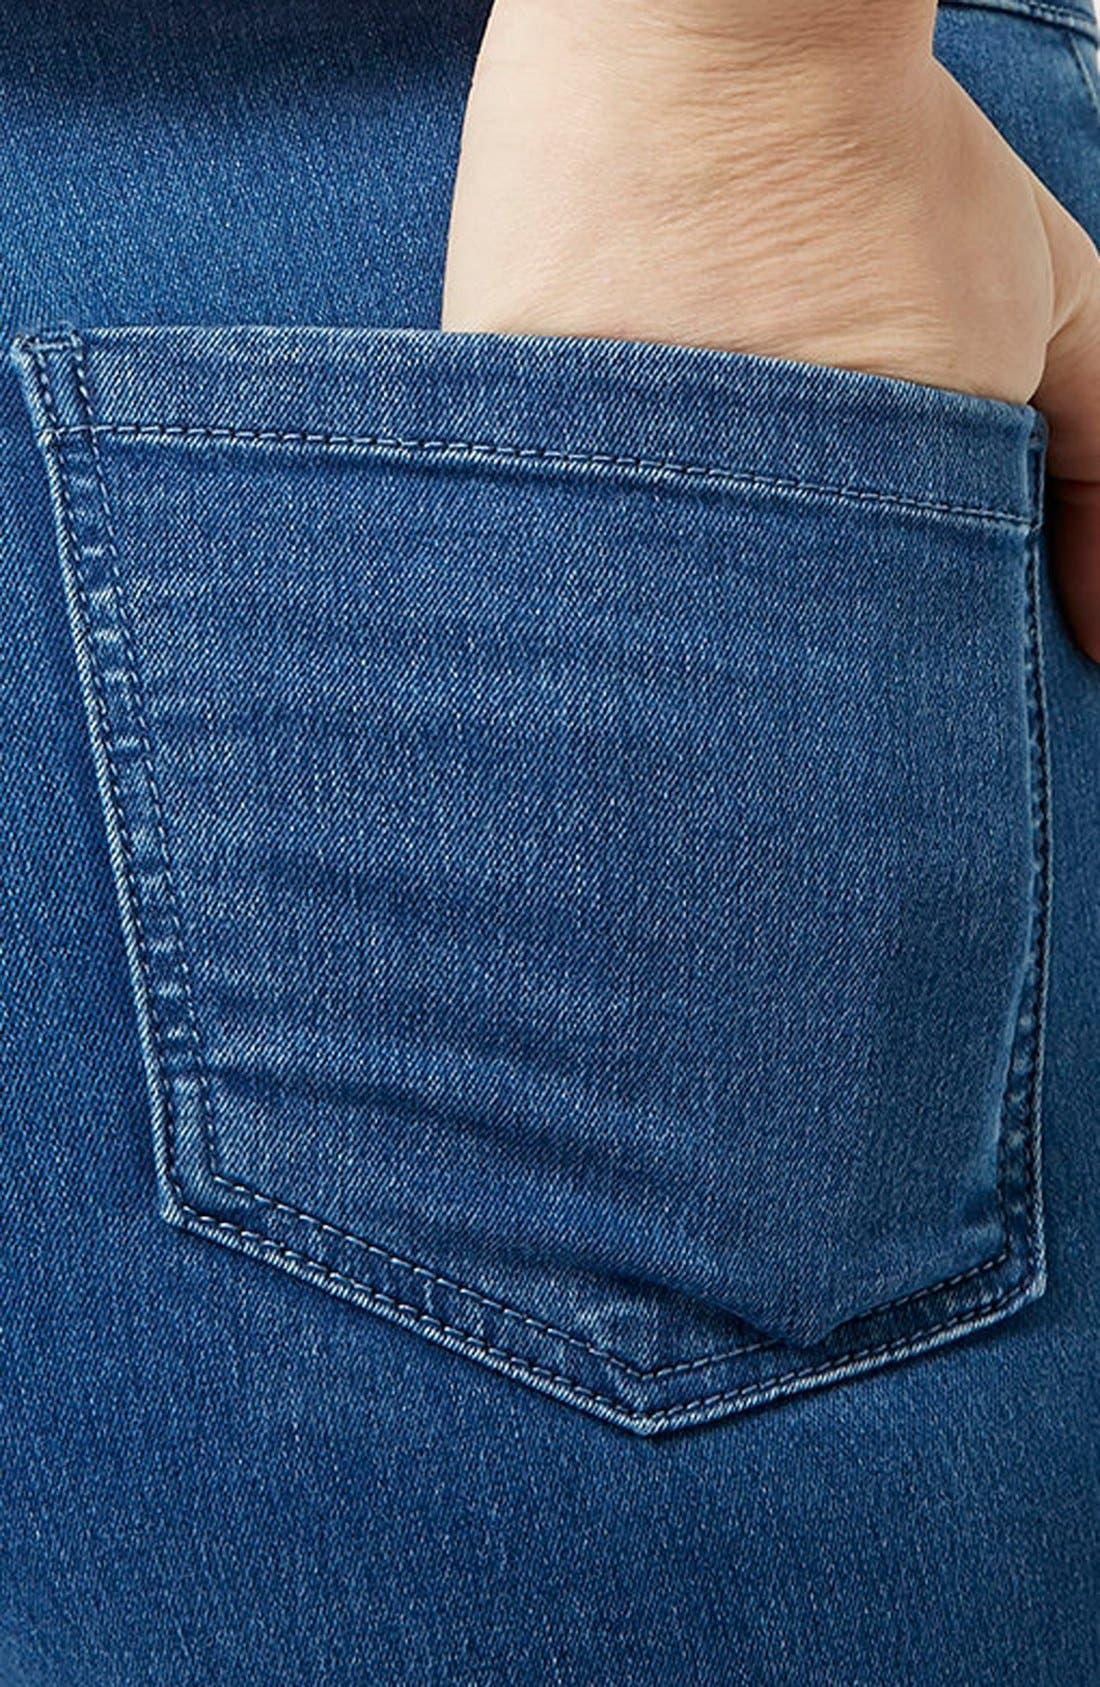 Alternate Image 3  - Topshop Moto 'Joni' High Rise Super Skinny Jeans (Mid Denim) (Petite)